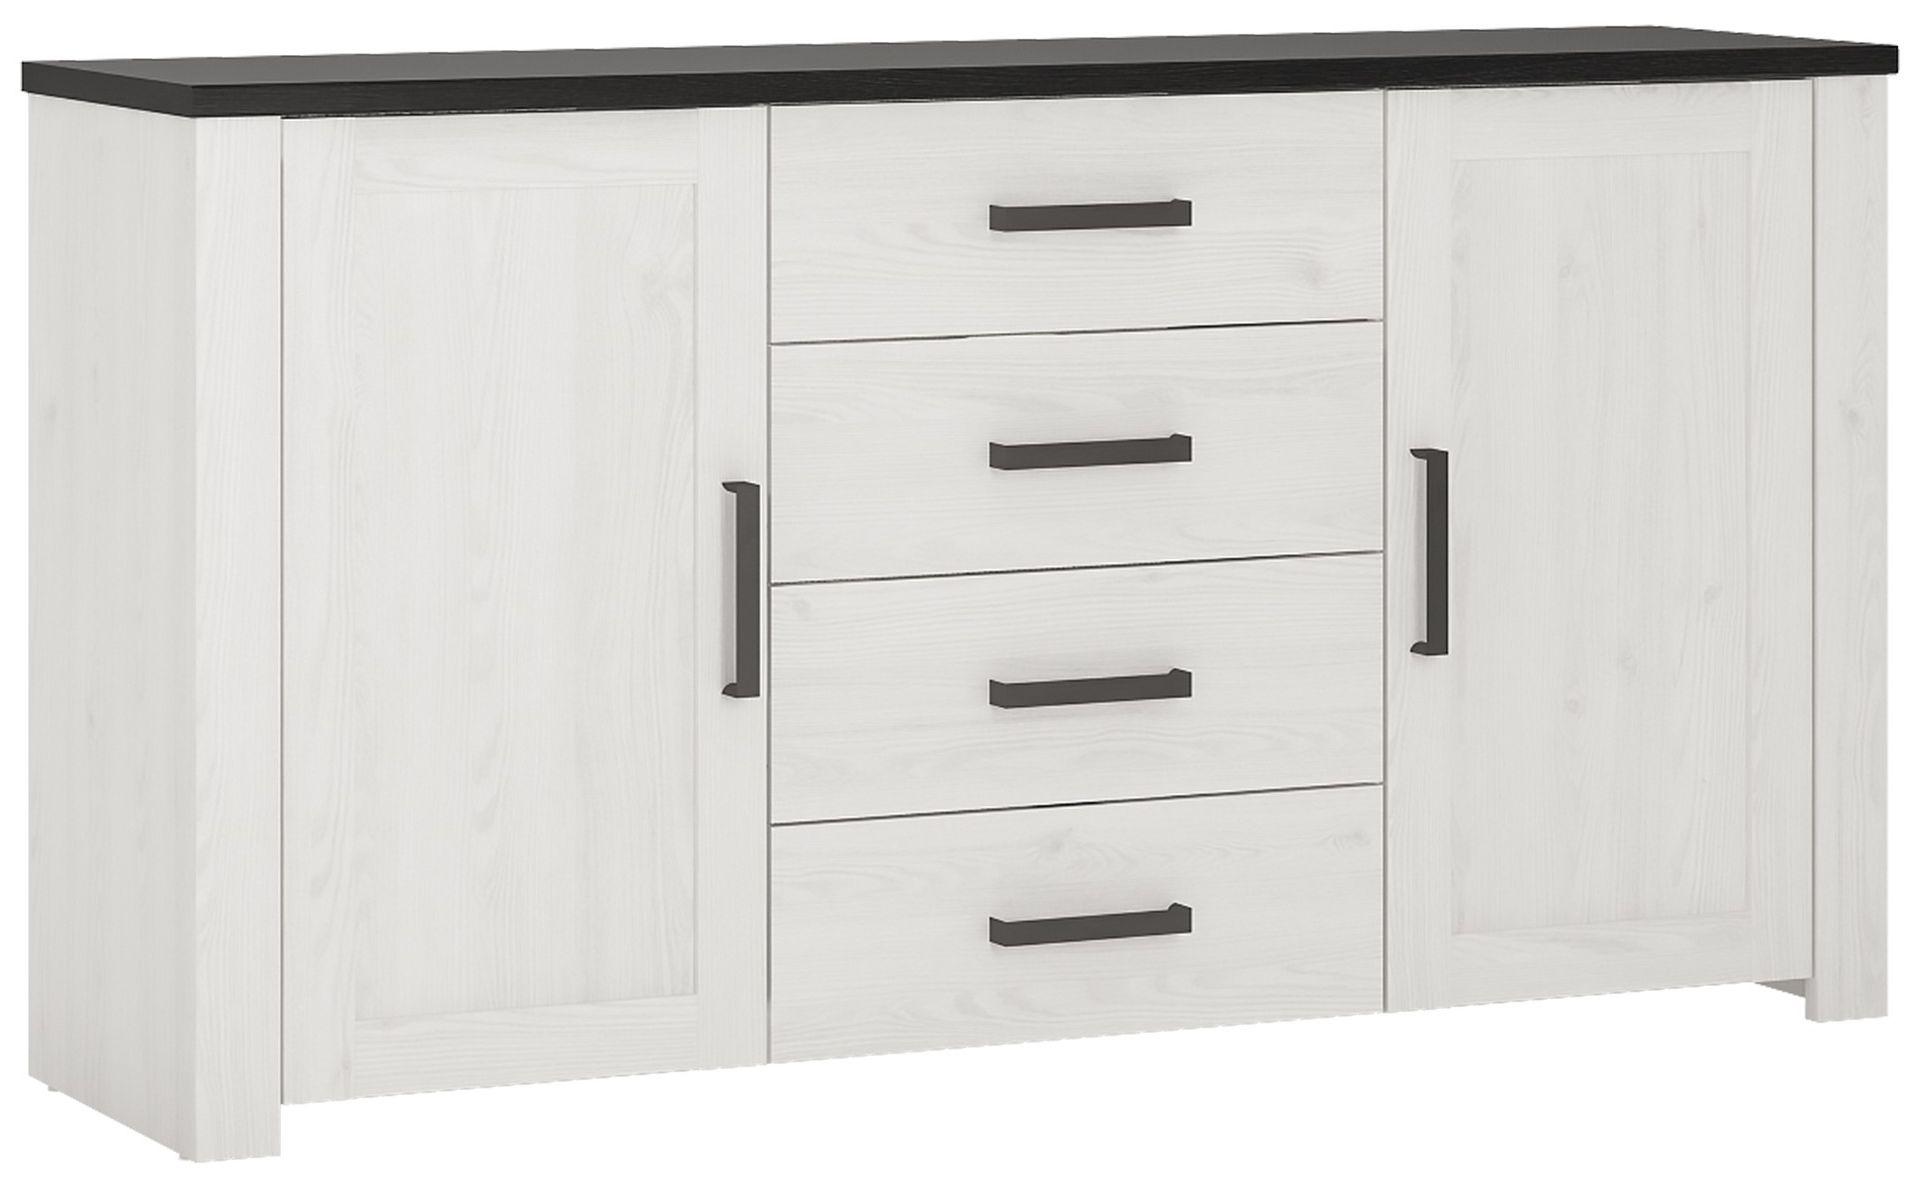 Provence Whitewash Larch Sideboard - 2 Door 4 Drawer